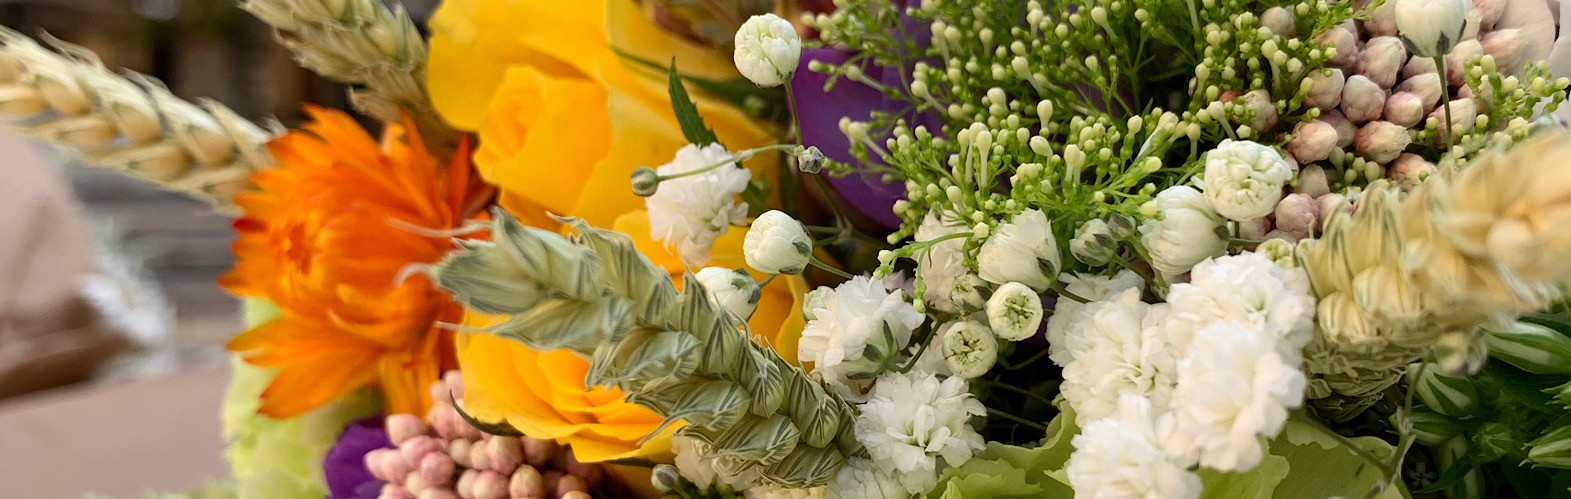 Flowers kit